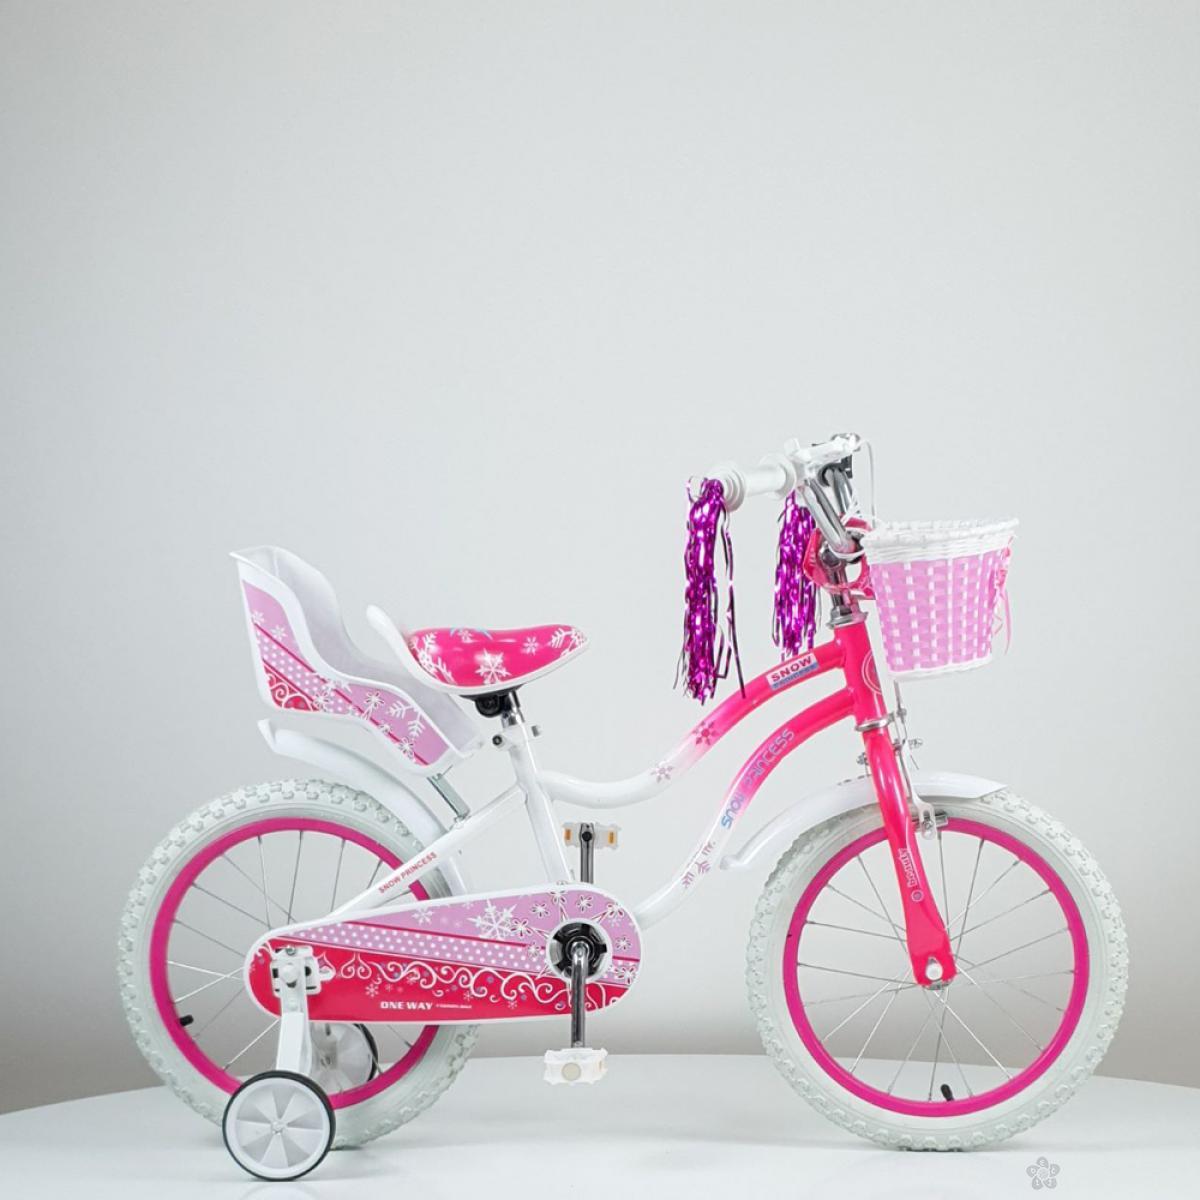 Dečiji bicikl Snow Princess model 716-16 pink